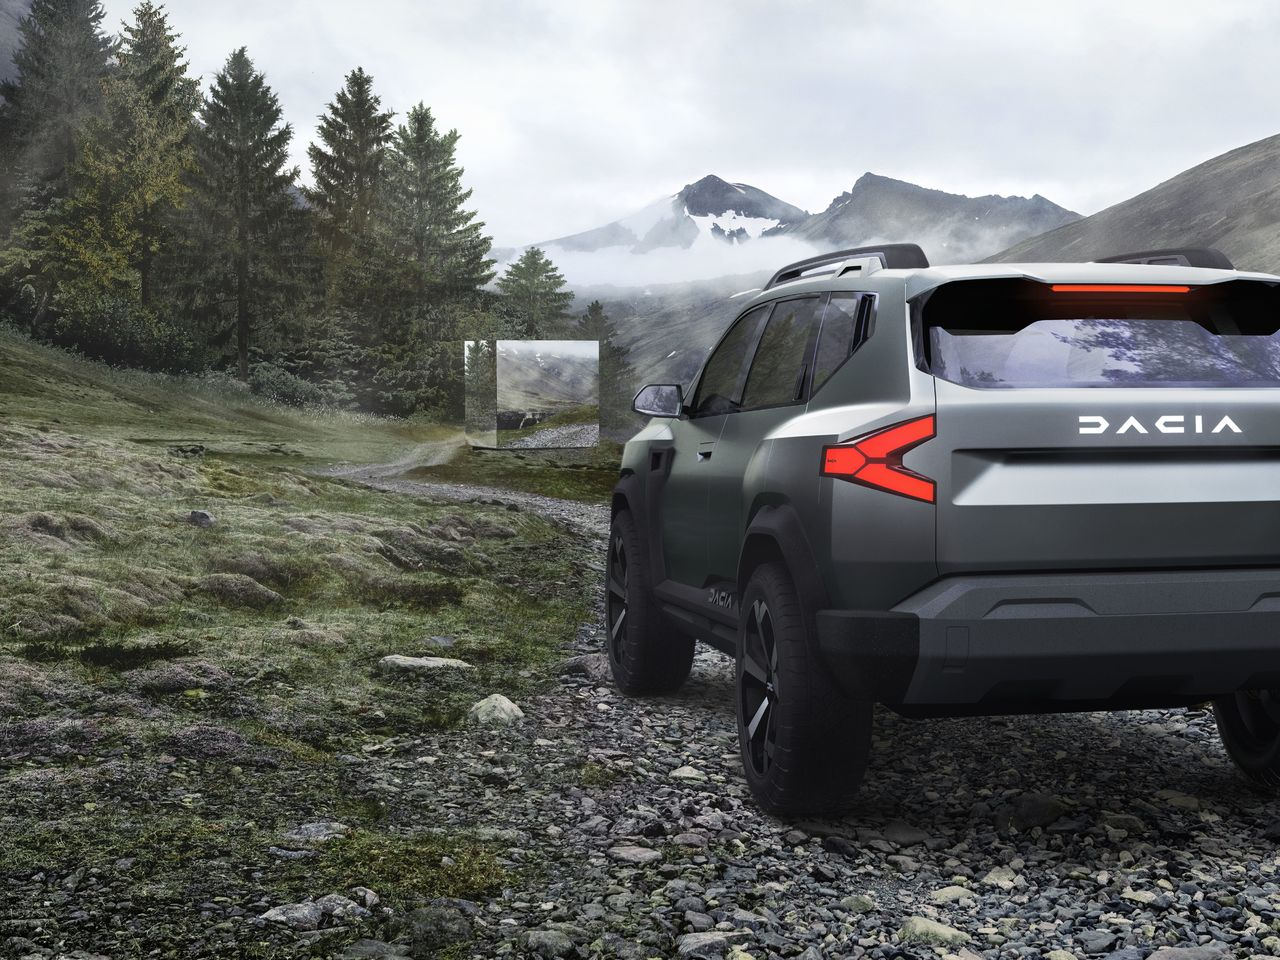 Dacia: neue Business Unit, neues Concept Car, mehr Coolness